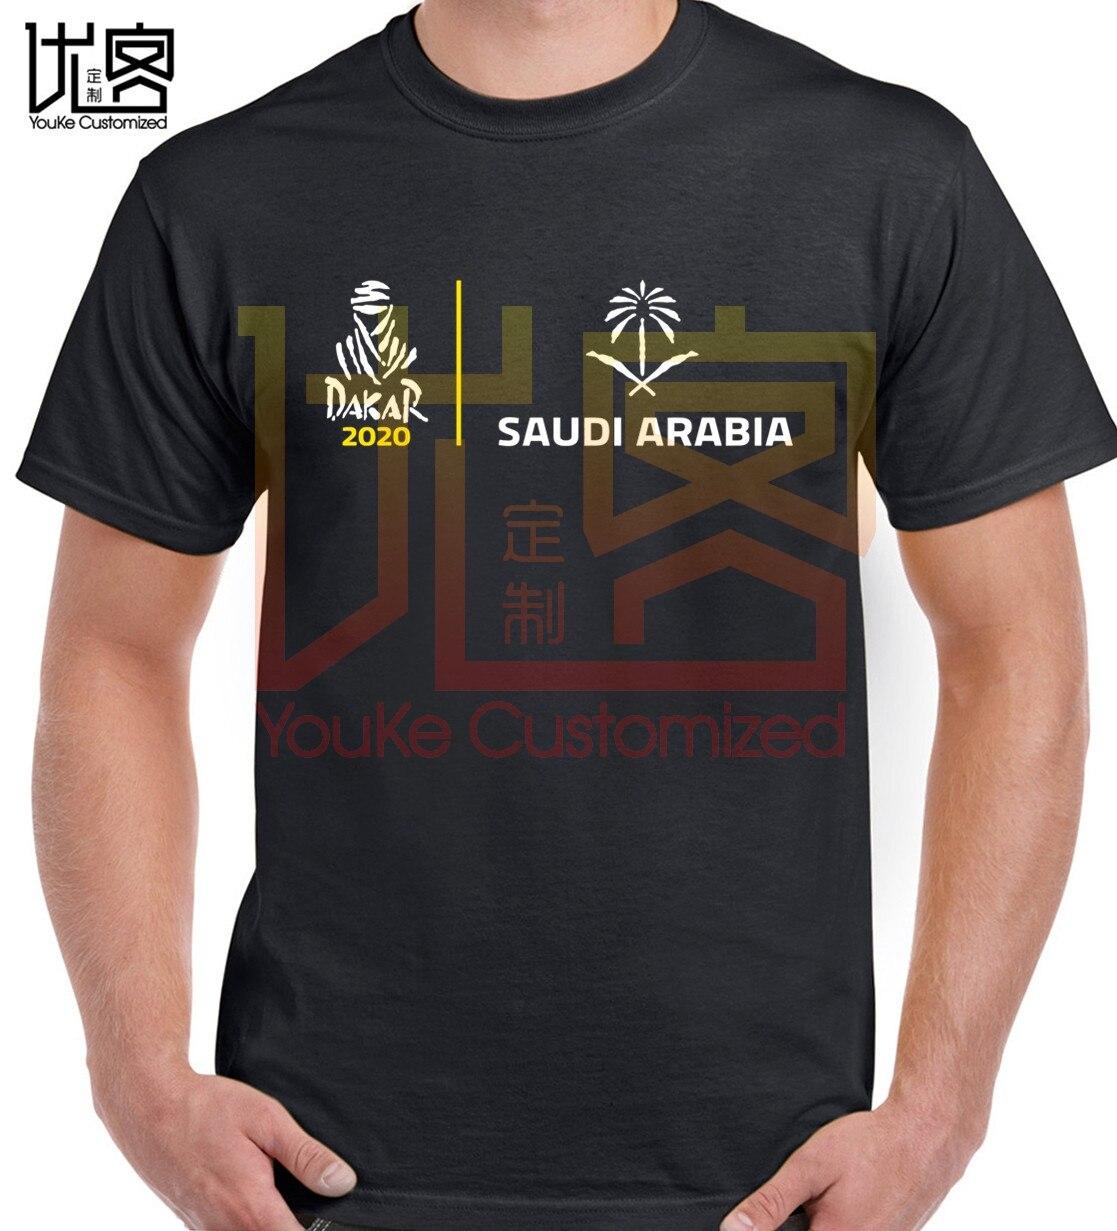 2020 Dakar Rally Racing Saudi Logo T Shirt Men's Women's 100% Cotton Short Sleeves Tops Tee Printed Crewneck Casual T-shirt